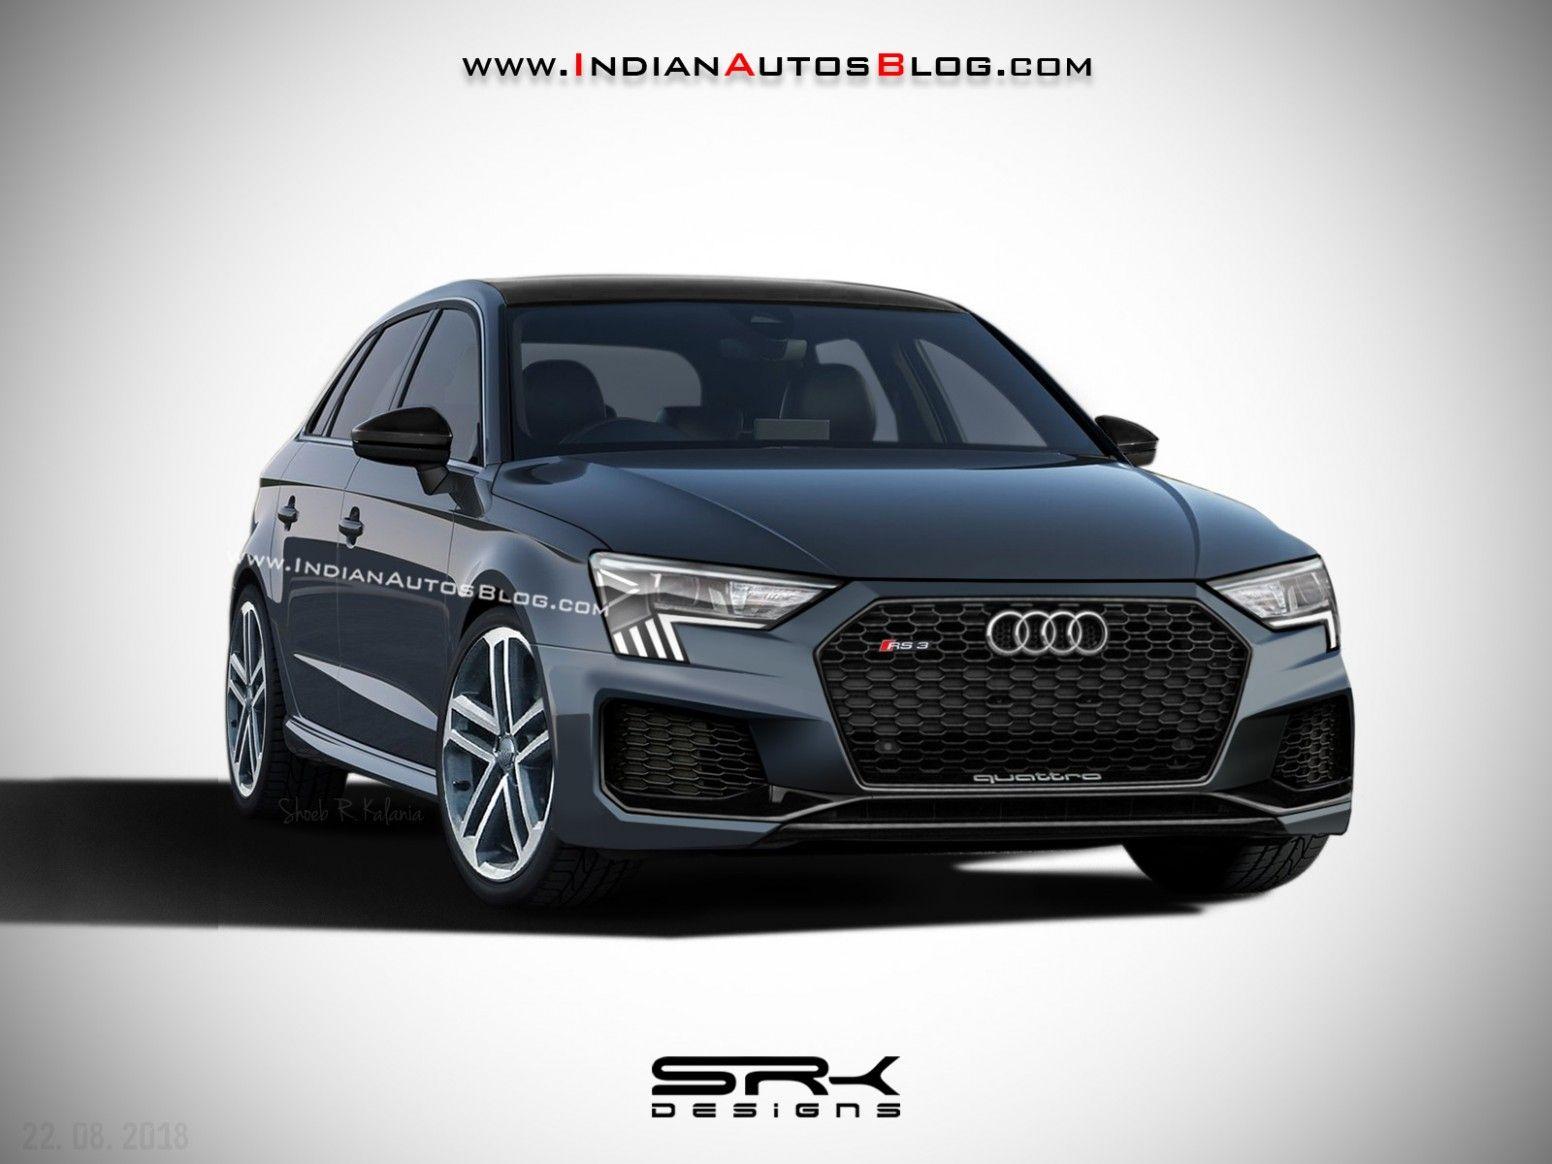 2020 Audi Rs3 Rumors Audi Rs3 Audi A3 Sportback Audi